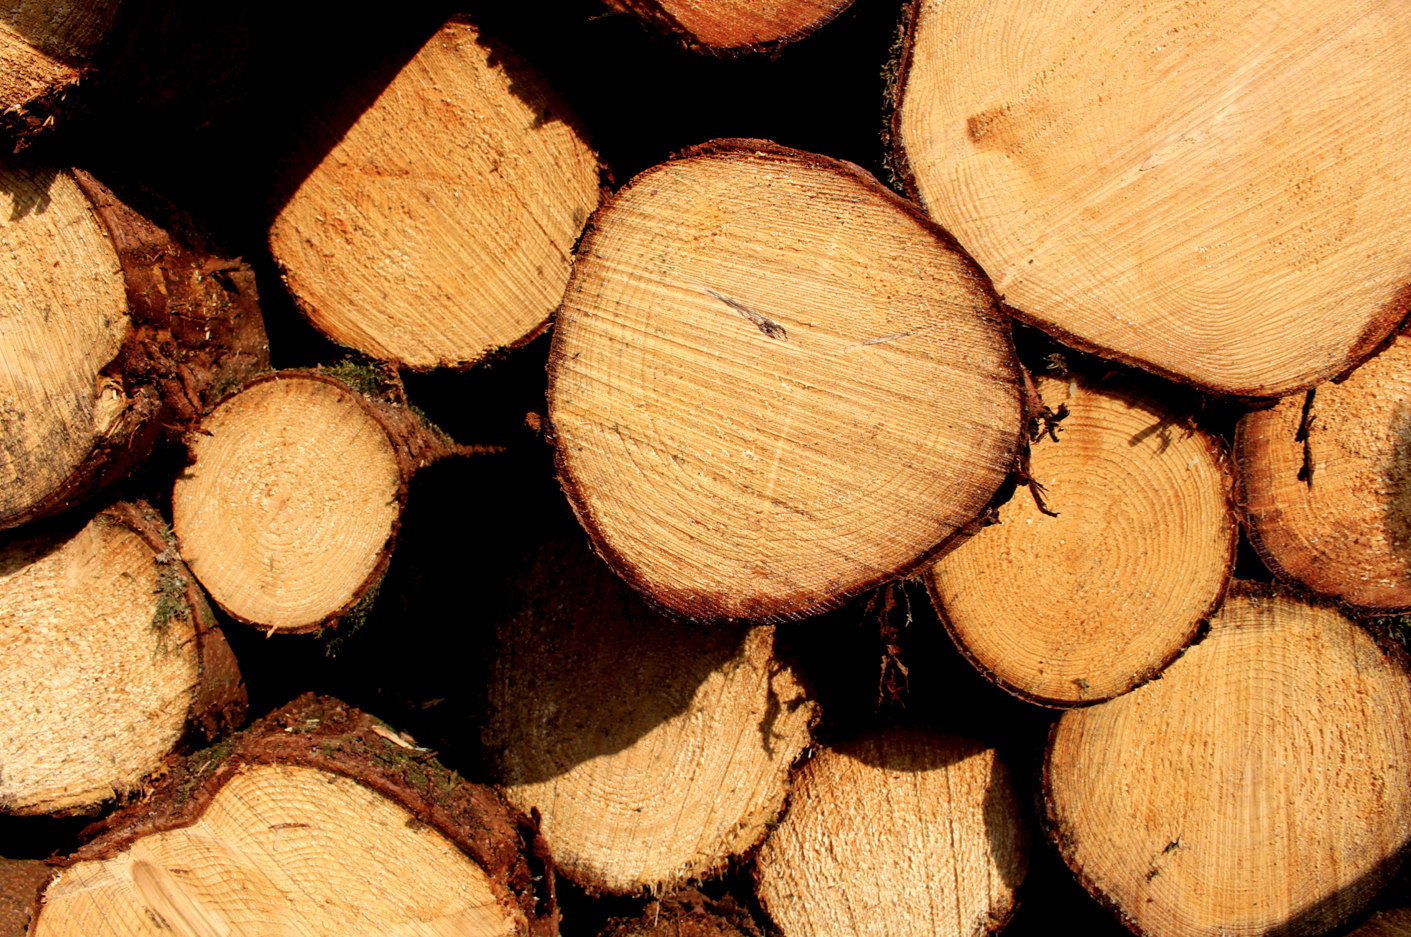 maybeyoulike_lumberjack_woods5